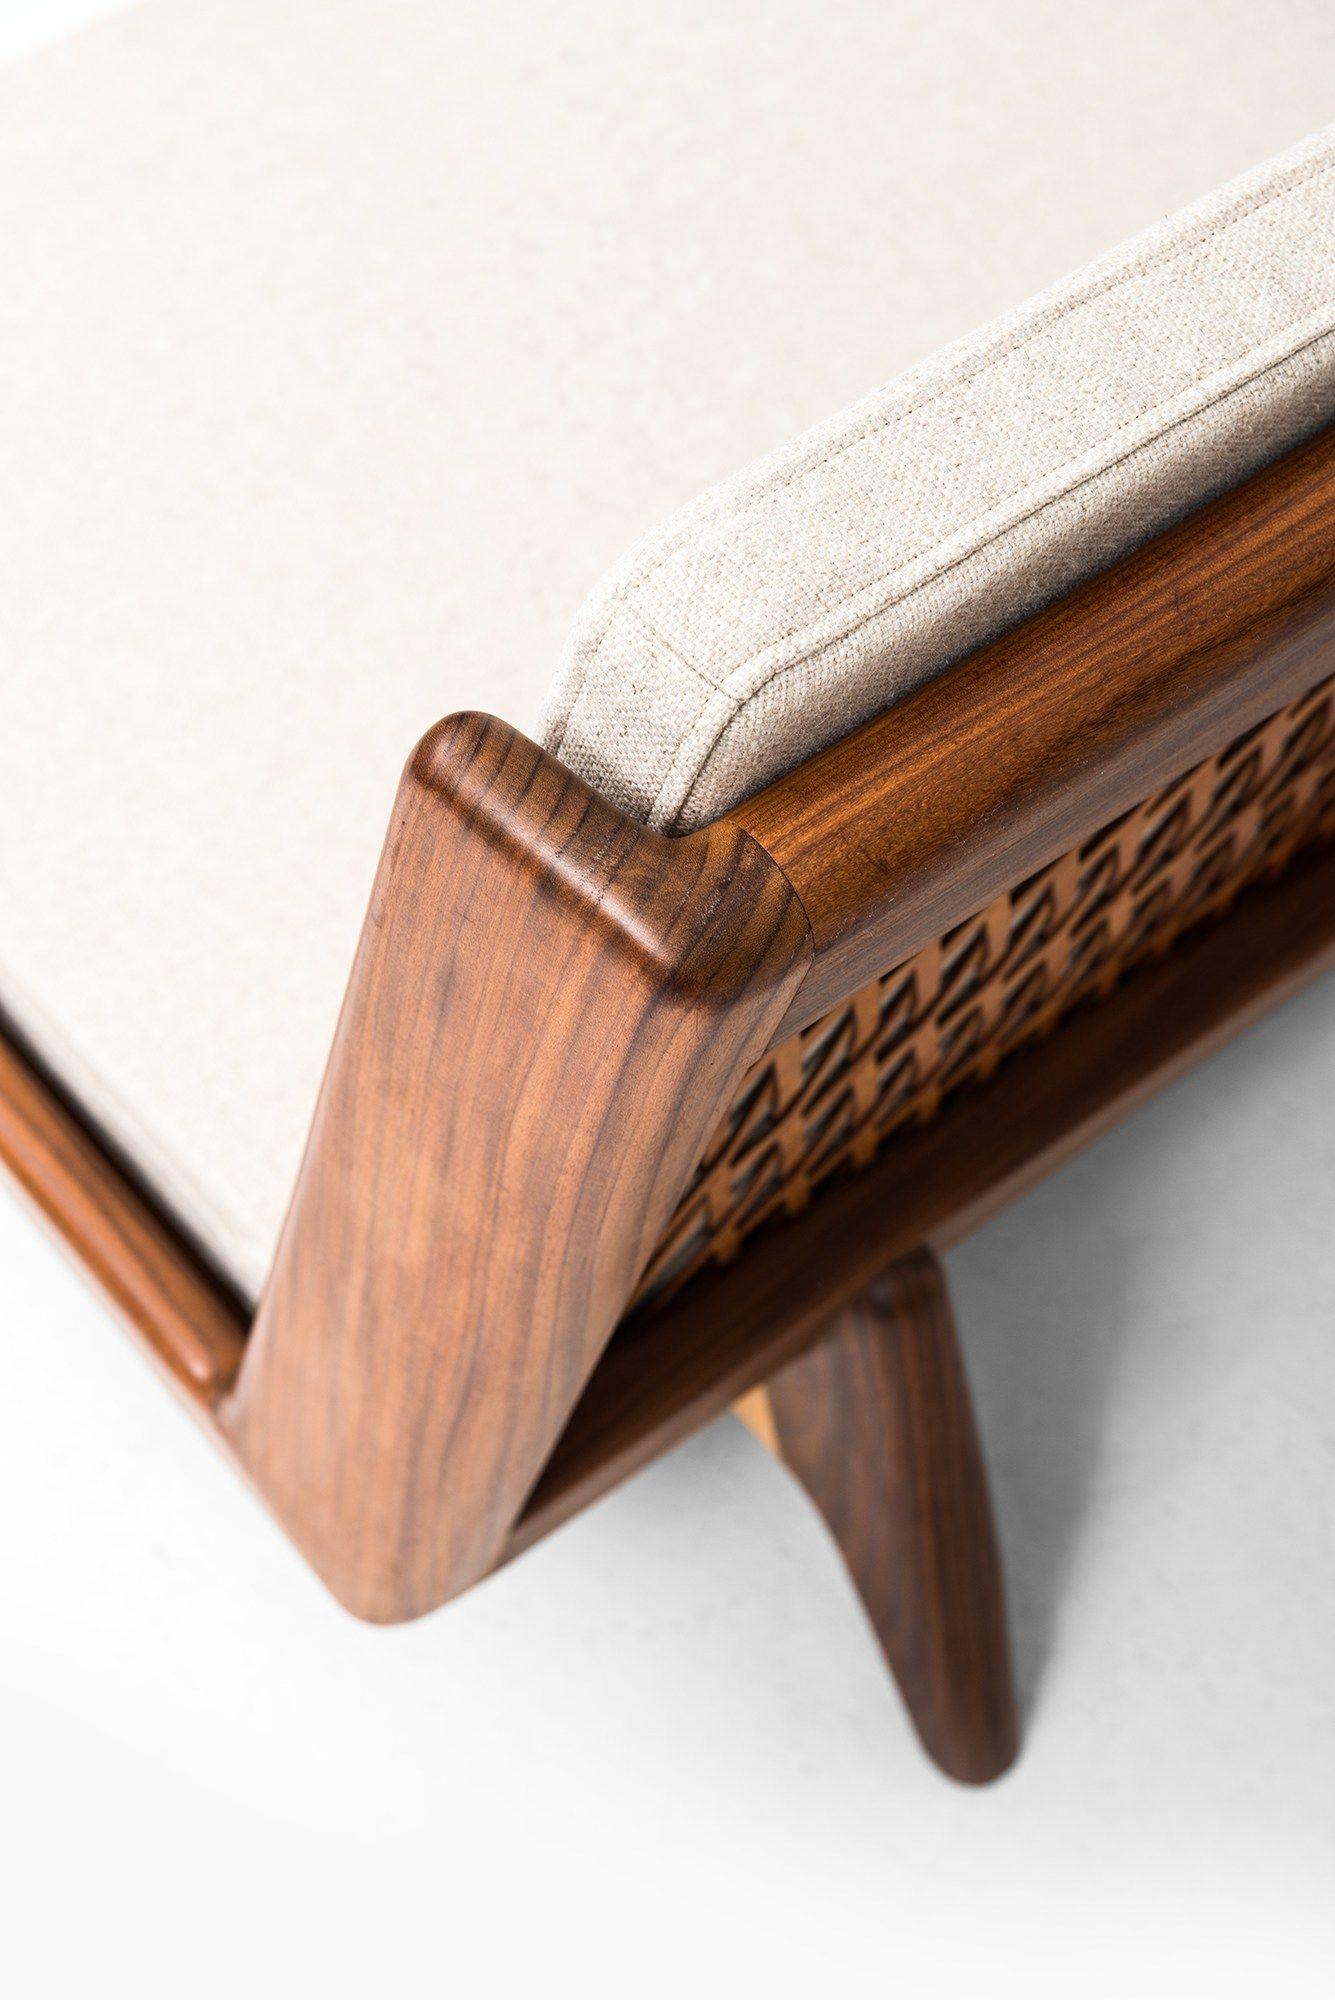 Sold o b j e c t s furniture design danish modern for Skandinavische retro mobel